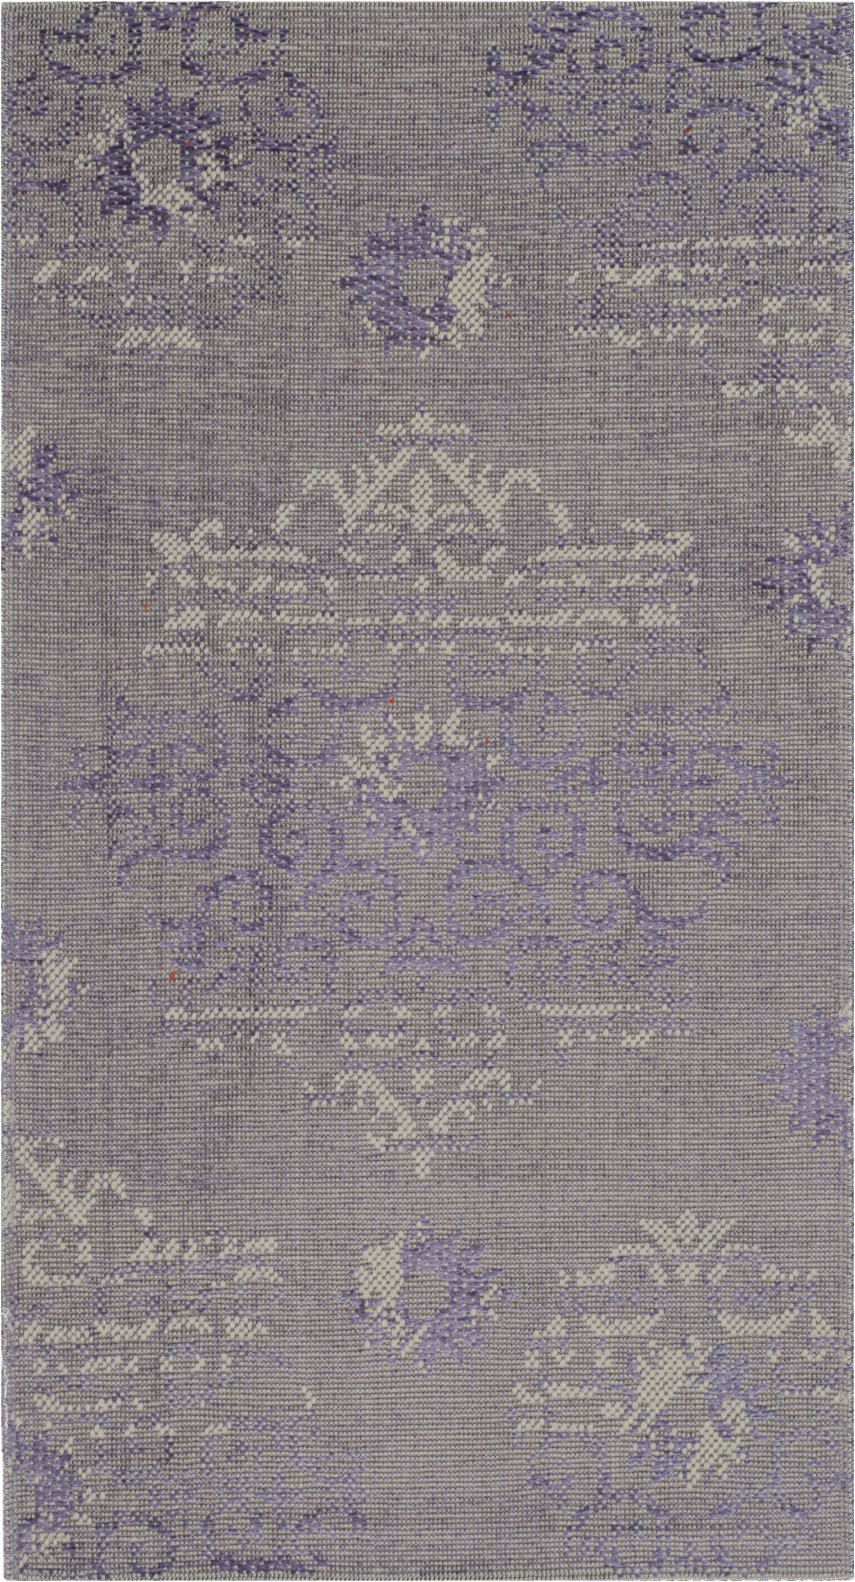 Lavender and Gray area Rugs Safavieh Palazzo Pal129 Purple Light Grey area Rug